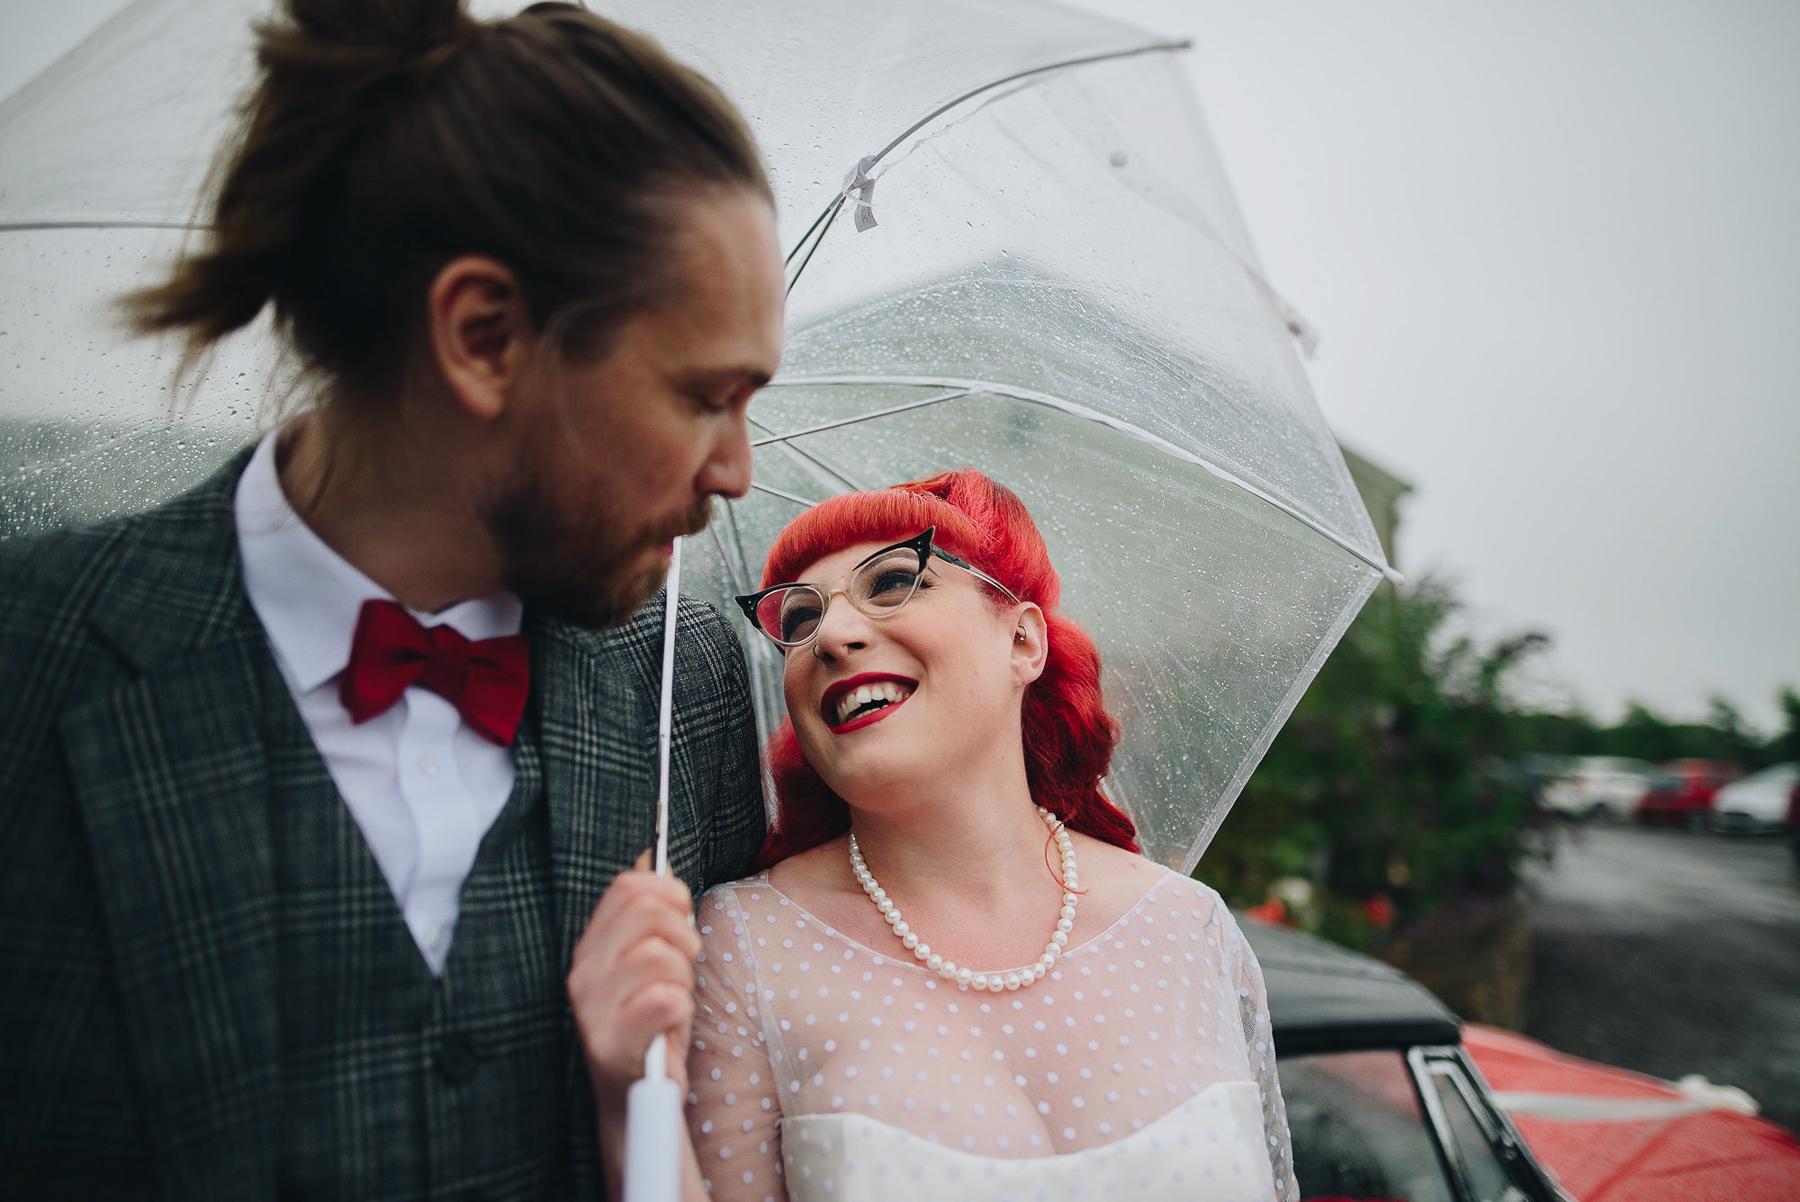 Wellbeing_Farm_Wedding_Photography_The_Pin-Up_Bride_Lara_Shaun-91.jpg